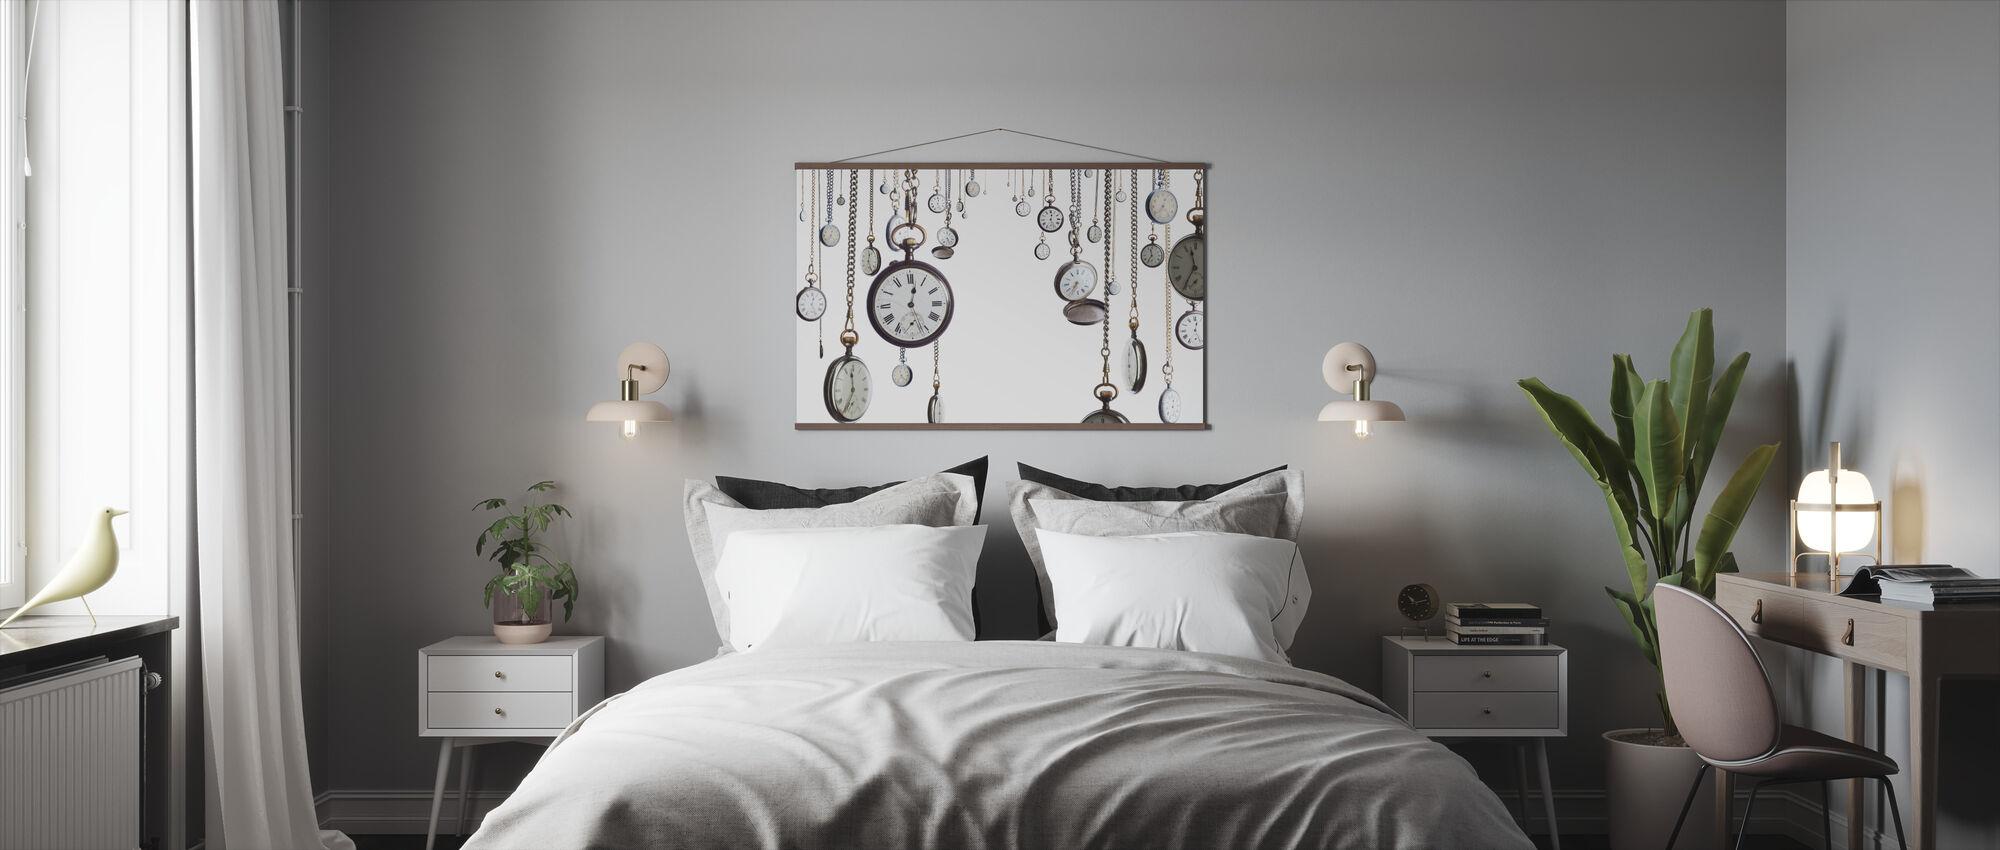 Vanhat kellot - Juliste - Makuuhuone